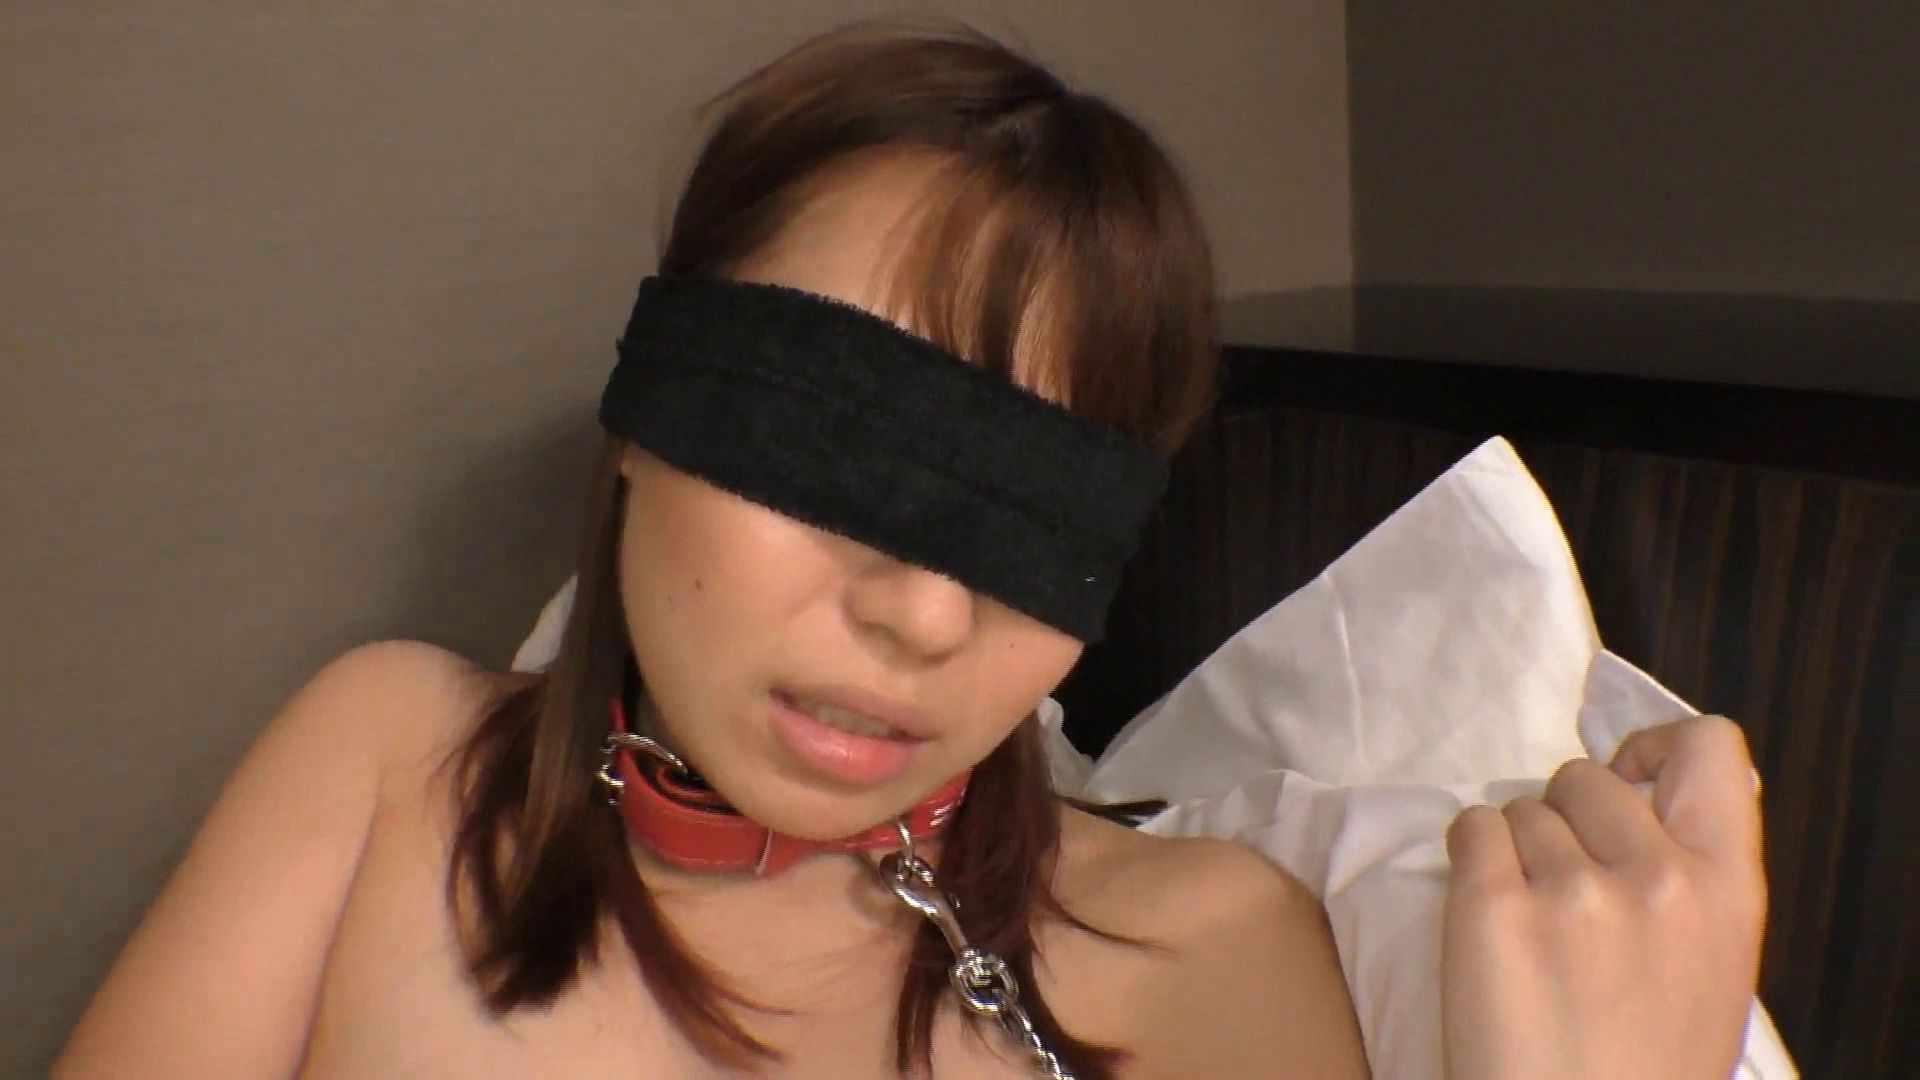 S級厳選美女ビッチガールVol.09 0   0  43画像 15